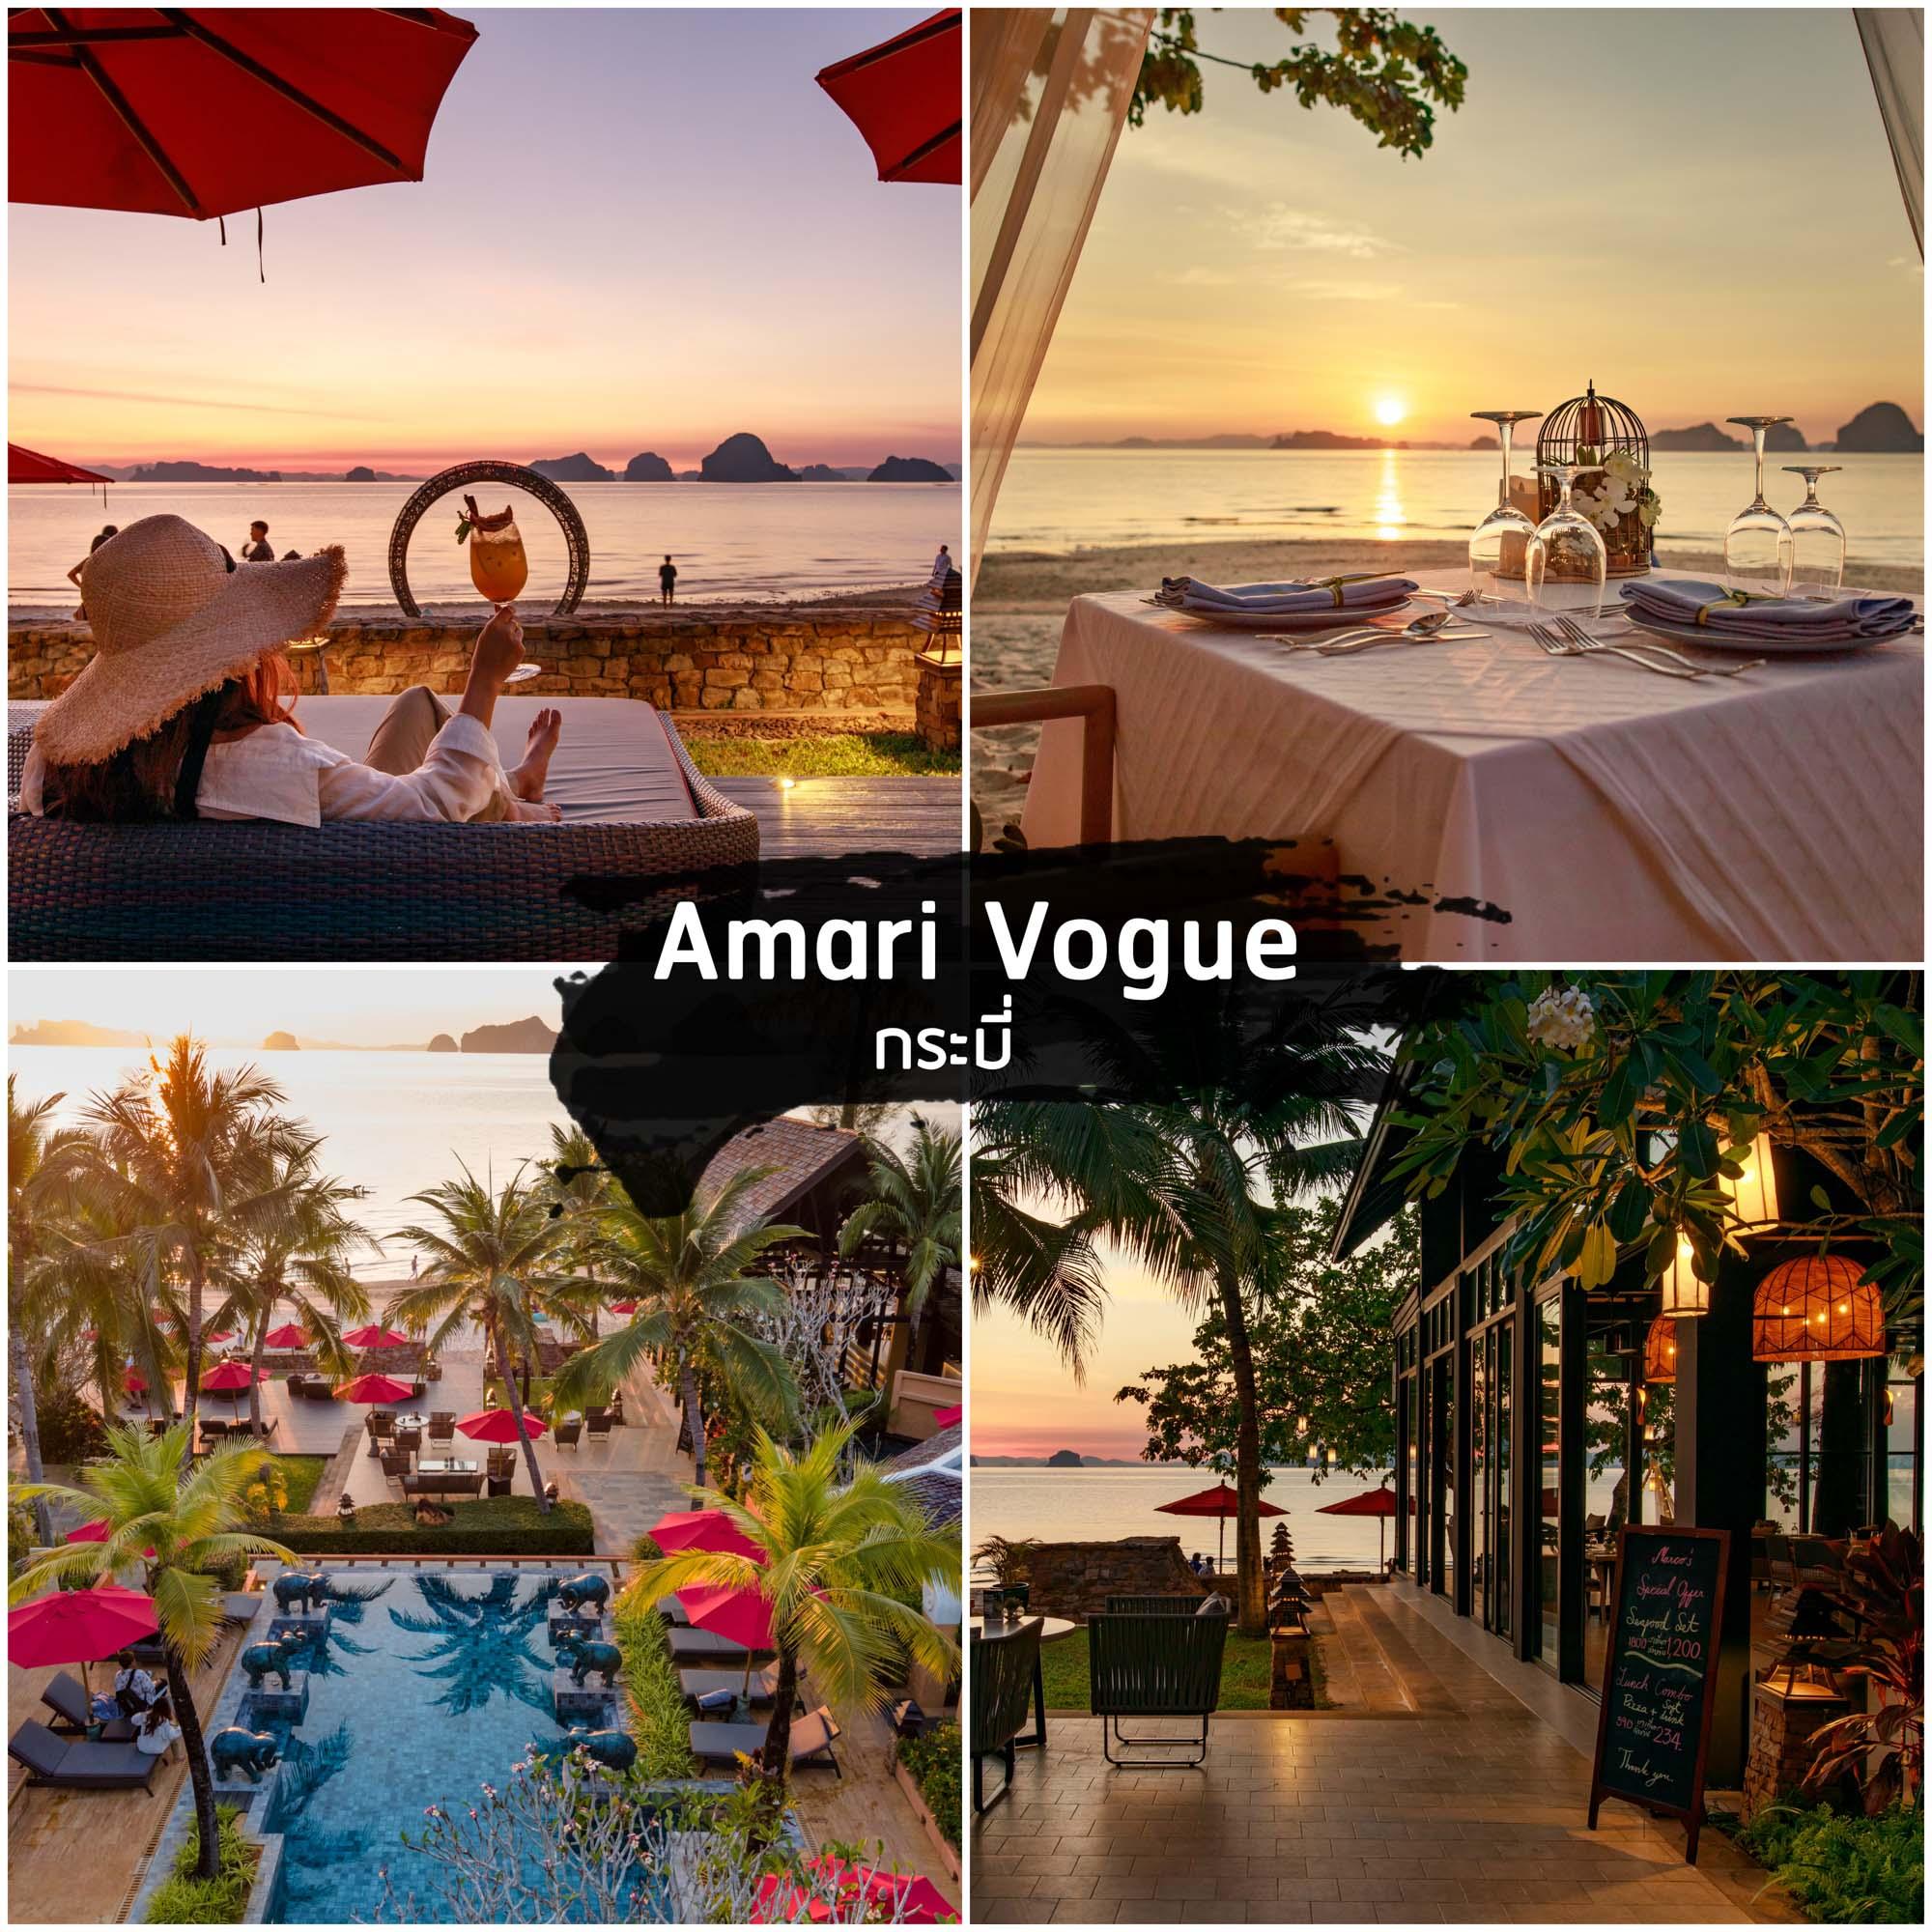 Amari-vogue-Krabi-อมารี-โวค-กระบี่ ที่พักกระบี่-รีสอร์ทโรงแรมระดับ-5-ดาวสุดสวยดีไซน์สไตล์โมเดิร์น-บนหาดทับแขก-ตกแต่งด้วยธีมร่มสีแดง-ตัดกับน้ำสีฟ้าและต้นไม้สีเขียว-บอกเลยว่าสวยมีสไตล์มากๆ-ชมพระอาทิตย์ตกกันฟินๆ-ด้วยความที่หาดทับแขก-เป็นหาดที่เงียบๆ--ทะเลไม่ลึก-เหมาะแก่การพักผ่อนแบบสบายๆ-ชายหาดเงียบสงบสายชิว-สายฟินๆ-นั่งชิวริมทะเลต้องห้ามพลาด-ภายในโรงแรมตกแต่งแบบสถาปัตยกรรมไทยสไตล์ล้านนา-โอบล้อมไปด้วยสีเขียวต้นไม้-มีบริการรถของโรงแรมรับ-ส่ง-สนามบิน-ซึ่งหากจากตัวเมืองกระบี่ประมาณ-45-กม.-มีห้องพักทั้งหมด-5-Type-คือ-Deluxe-King-,--Grand-Deluxe-King ,Grand-Deluxe-Jacuzzi ,Spa-Suite ,One-Bedroom-Villa-ทุกห้องจะวิวทะเลเกือบทั้งหมด-เรียกได้ว่าสาย-Seaview-ต้องห้ามพลาดกันเลยทีเดียว กระบี่,จุดเช็คอิน,ที่เที่ยว,ร้านกาแฟ,คาเฟ่,ทะเล,ภูเขา